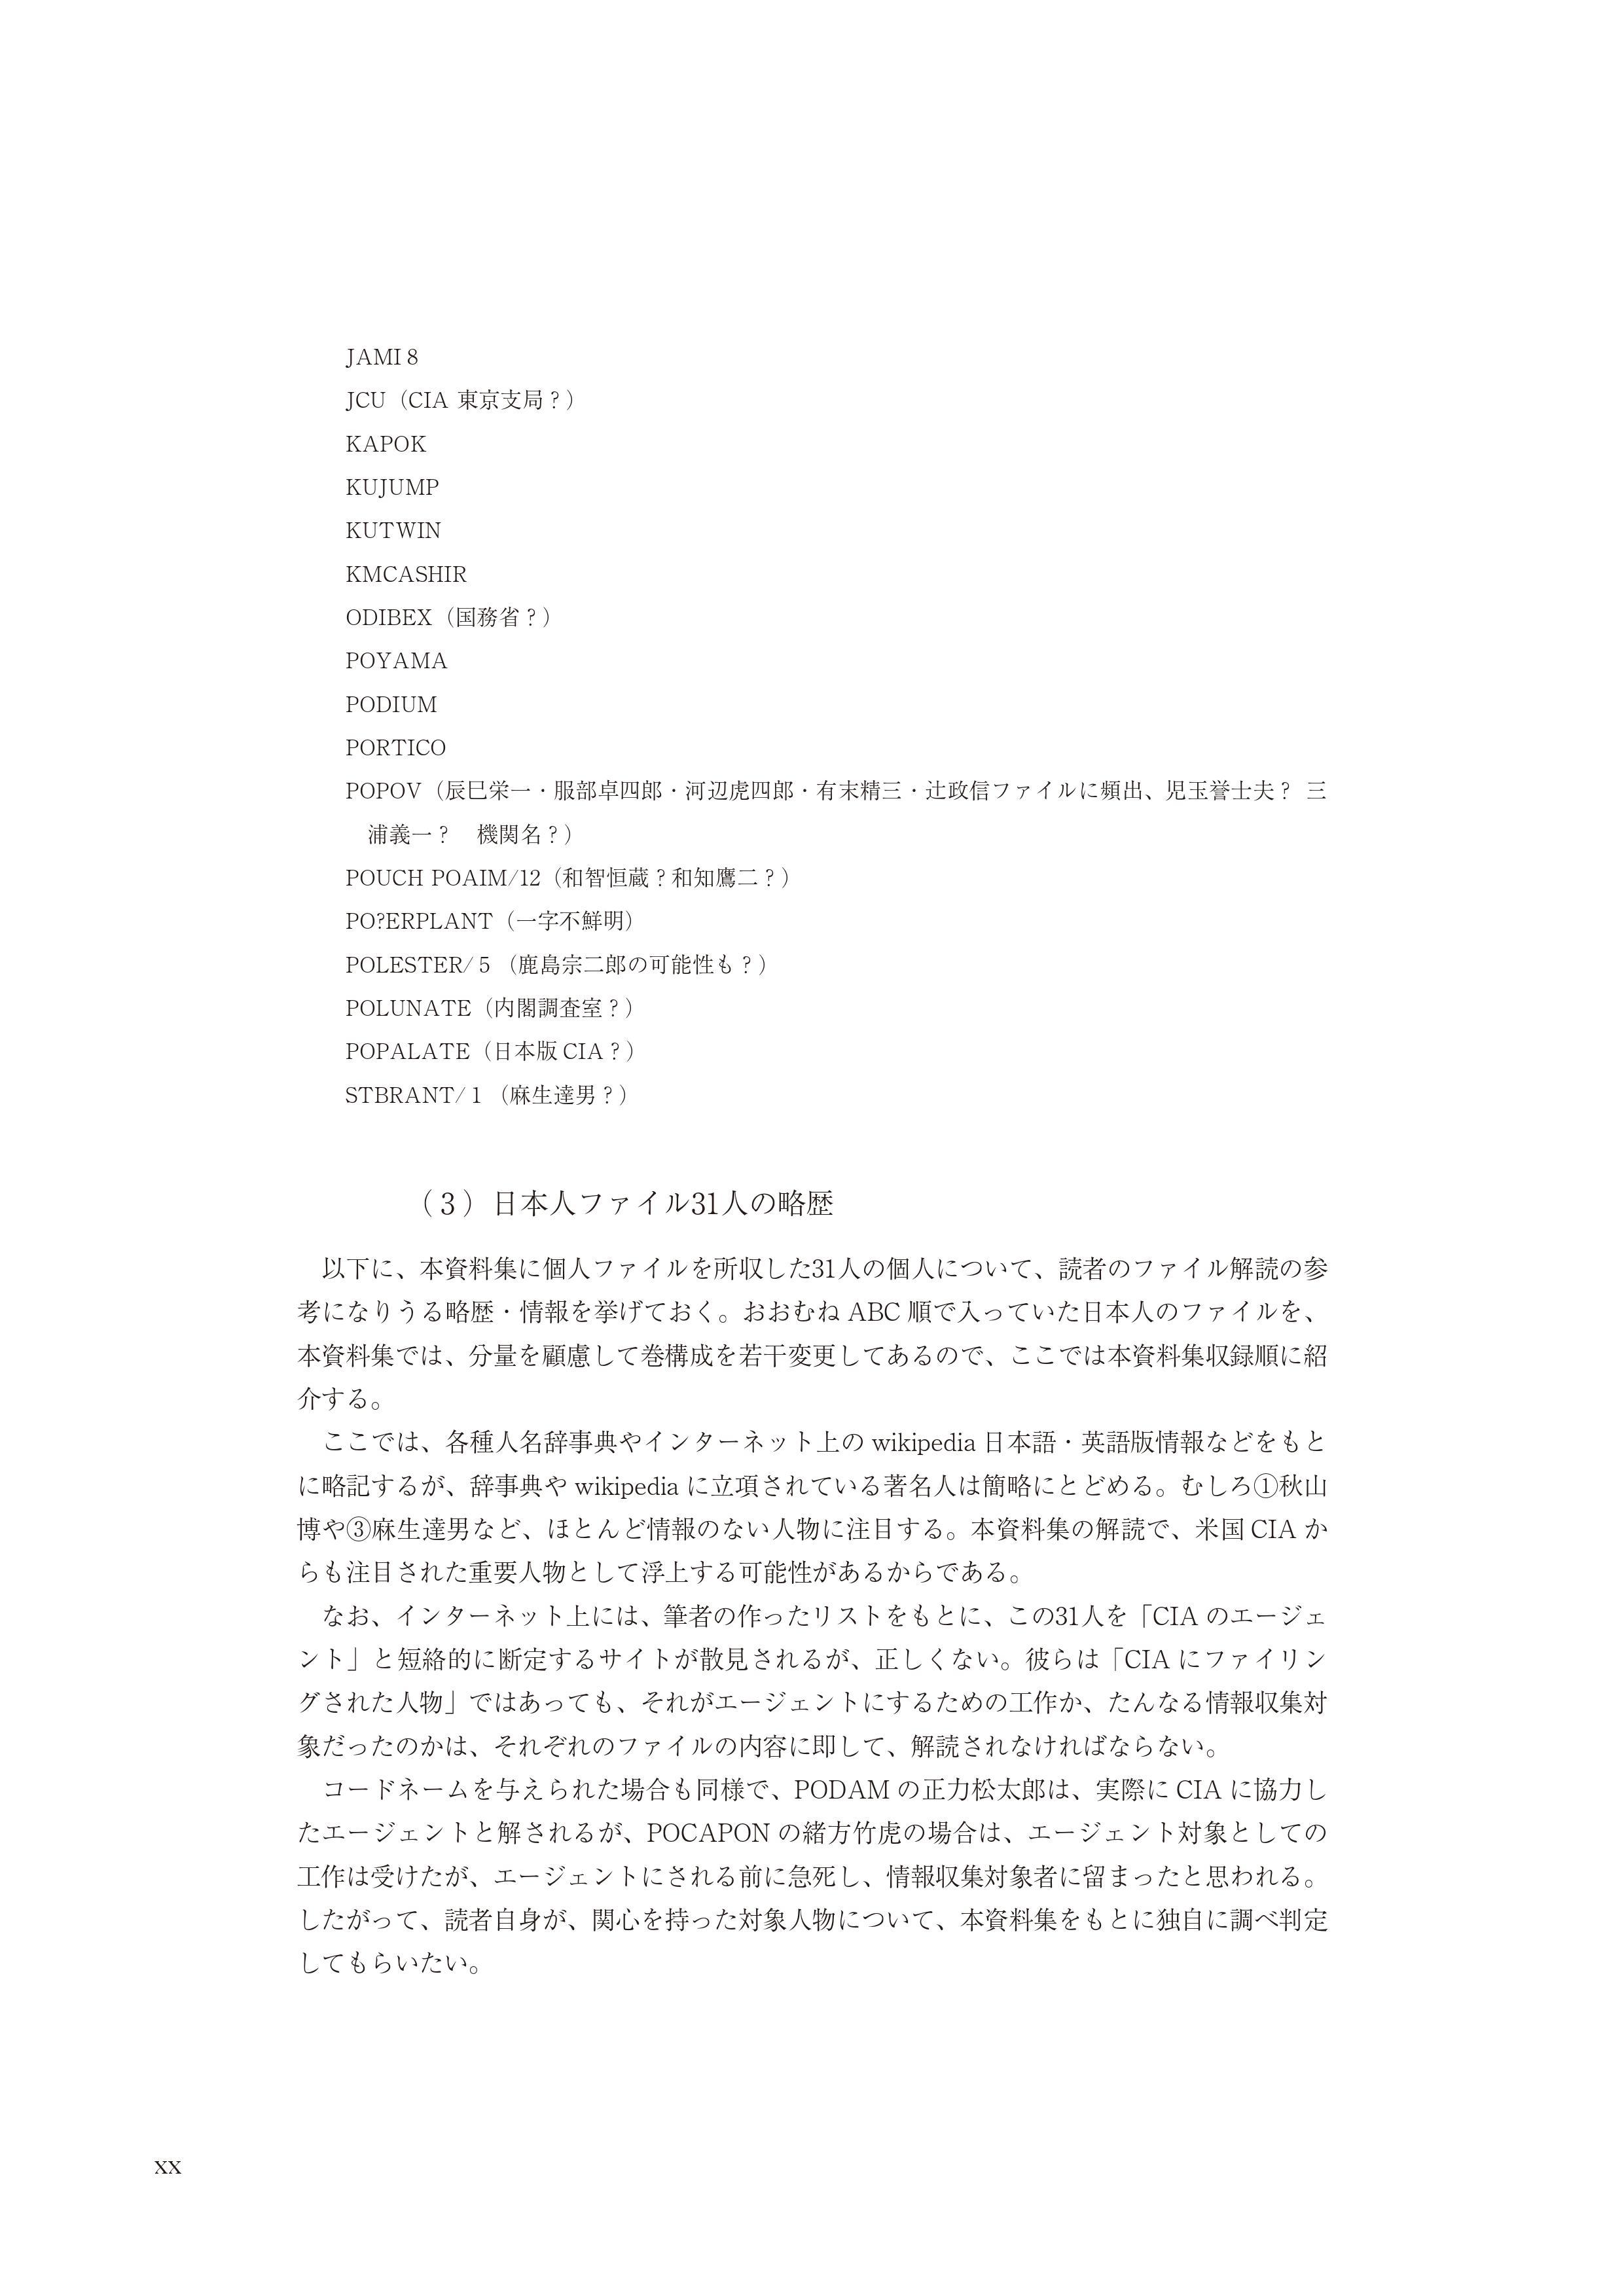 CIA日本人ファイル0001 (20)